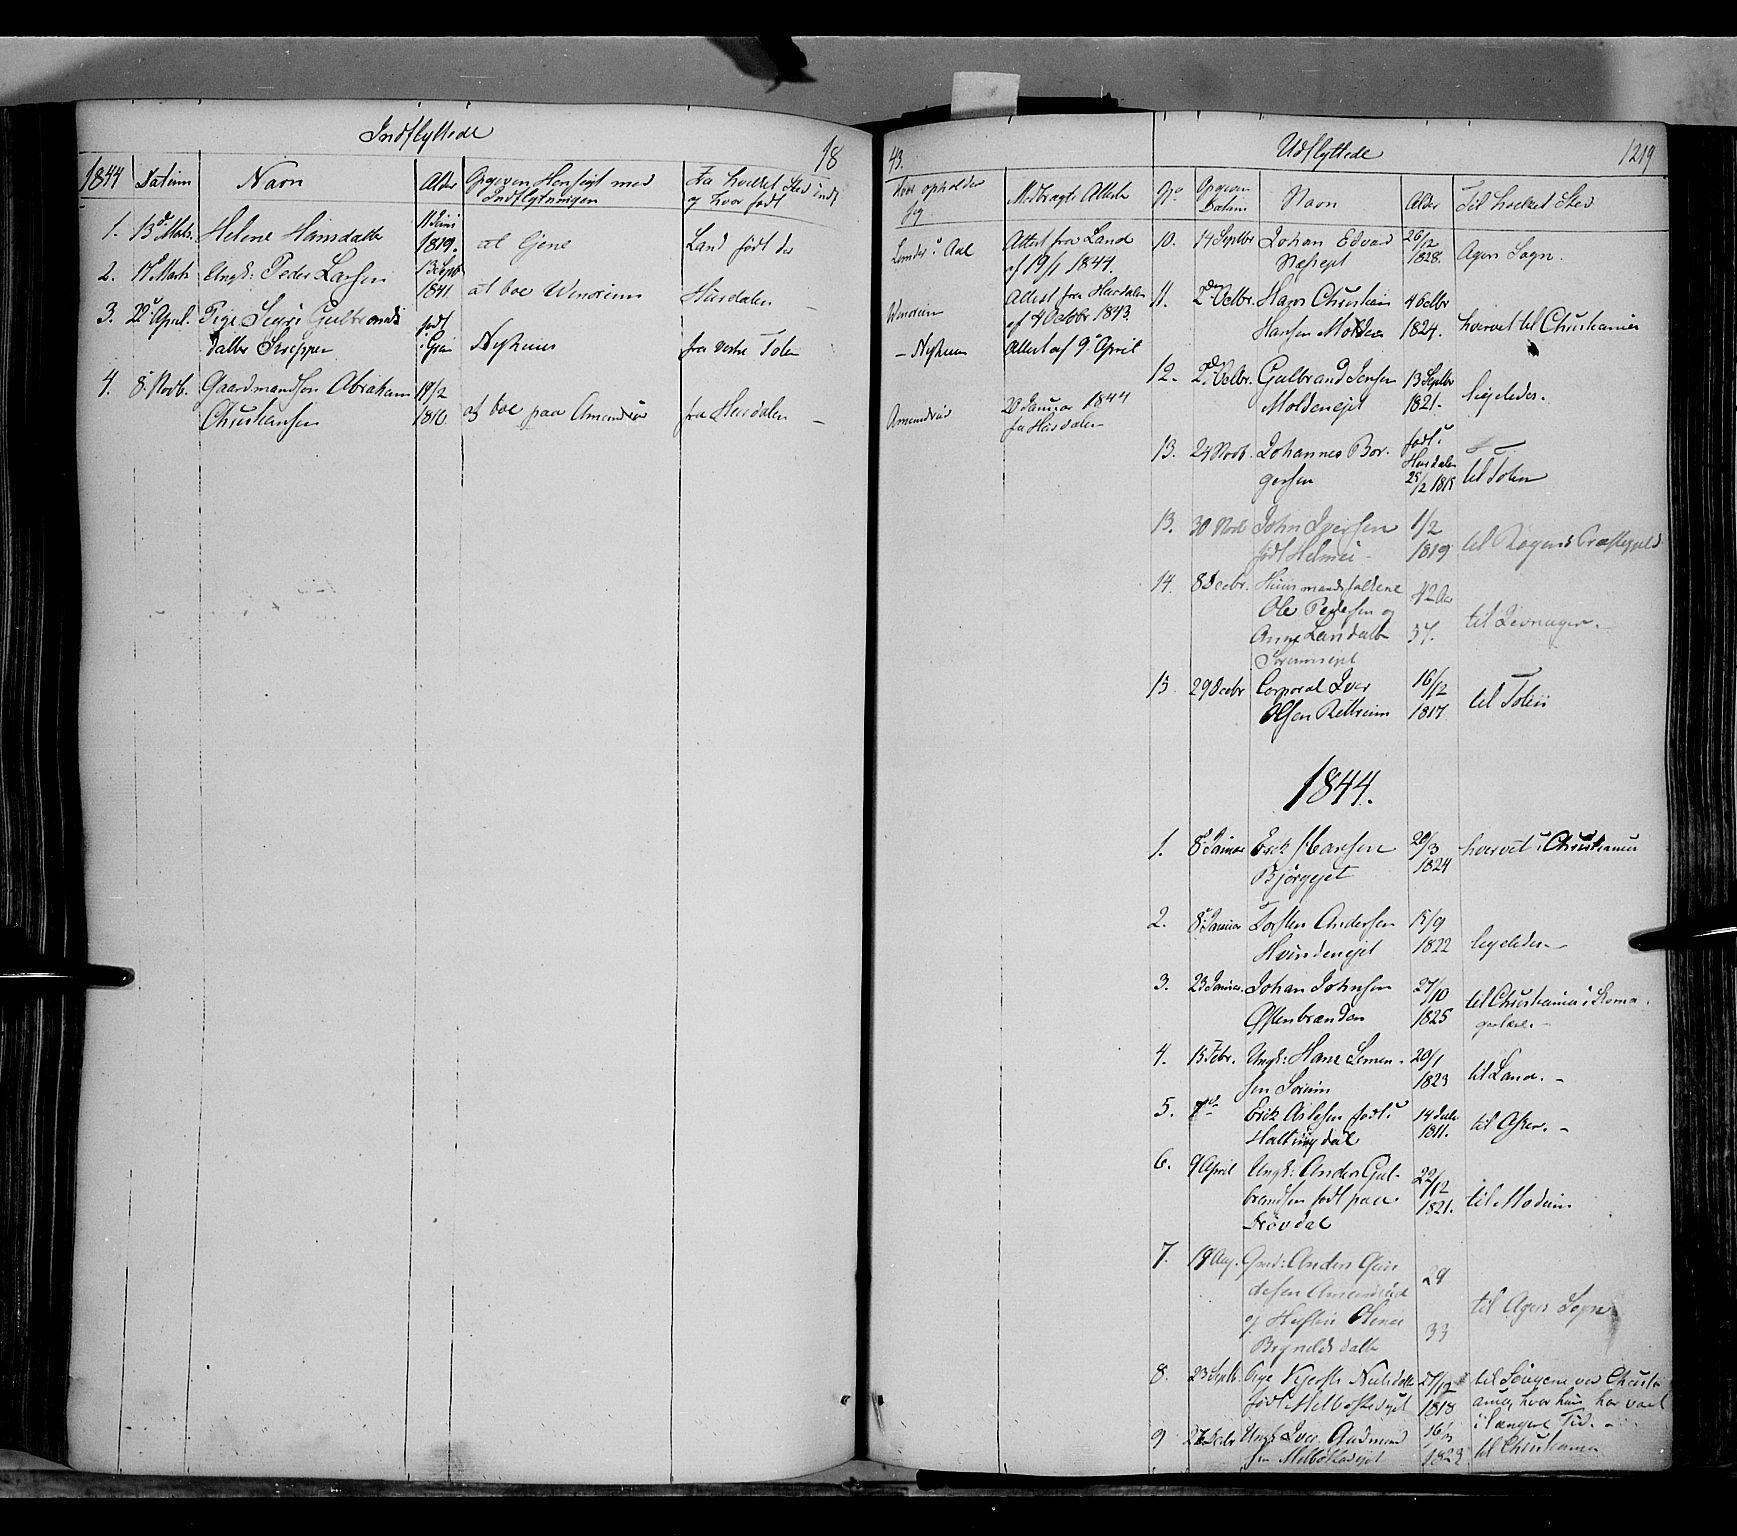 SAH, Gran prestekontor, Ministerialbok nr. 11, 1842-1856, s. 1218-1219